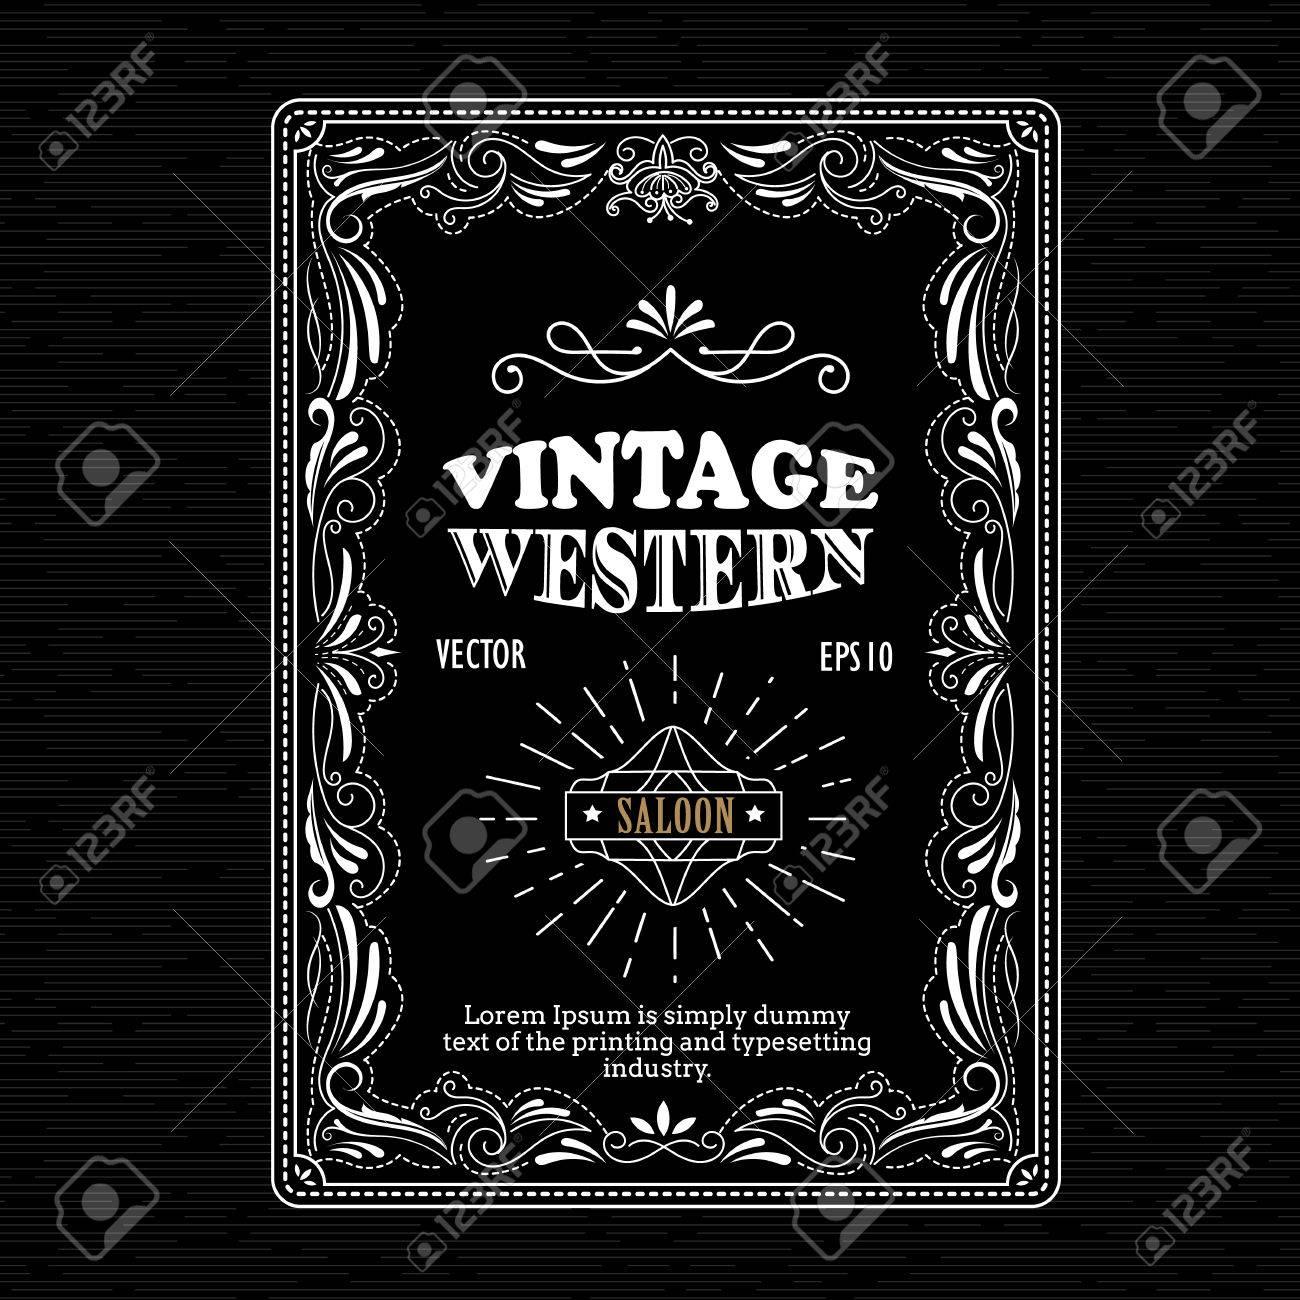 Vintage Marco Frontera Occidental Etiqueta Mano Dibujado Retro ...